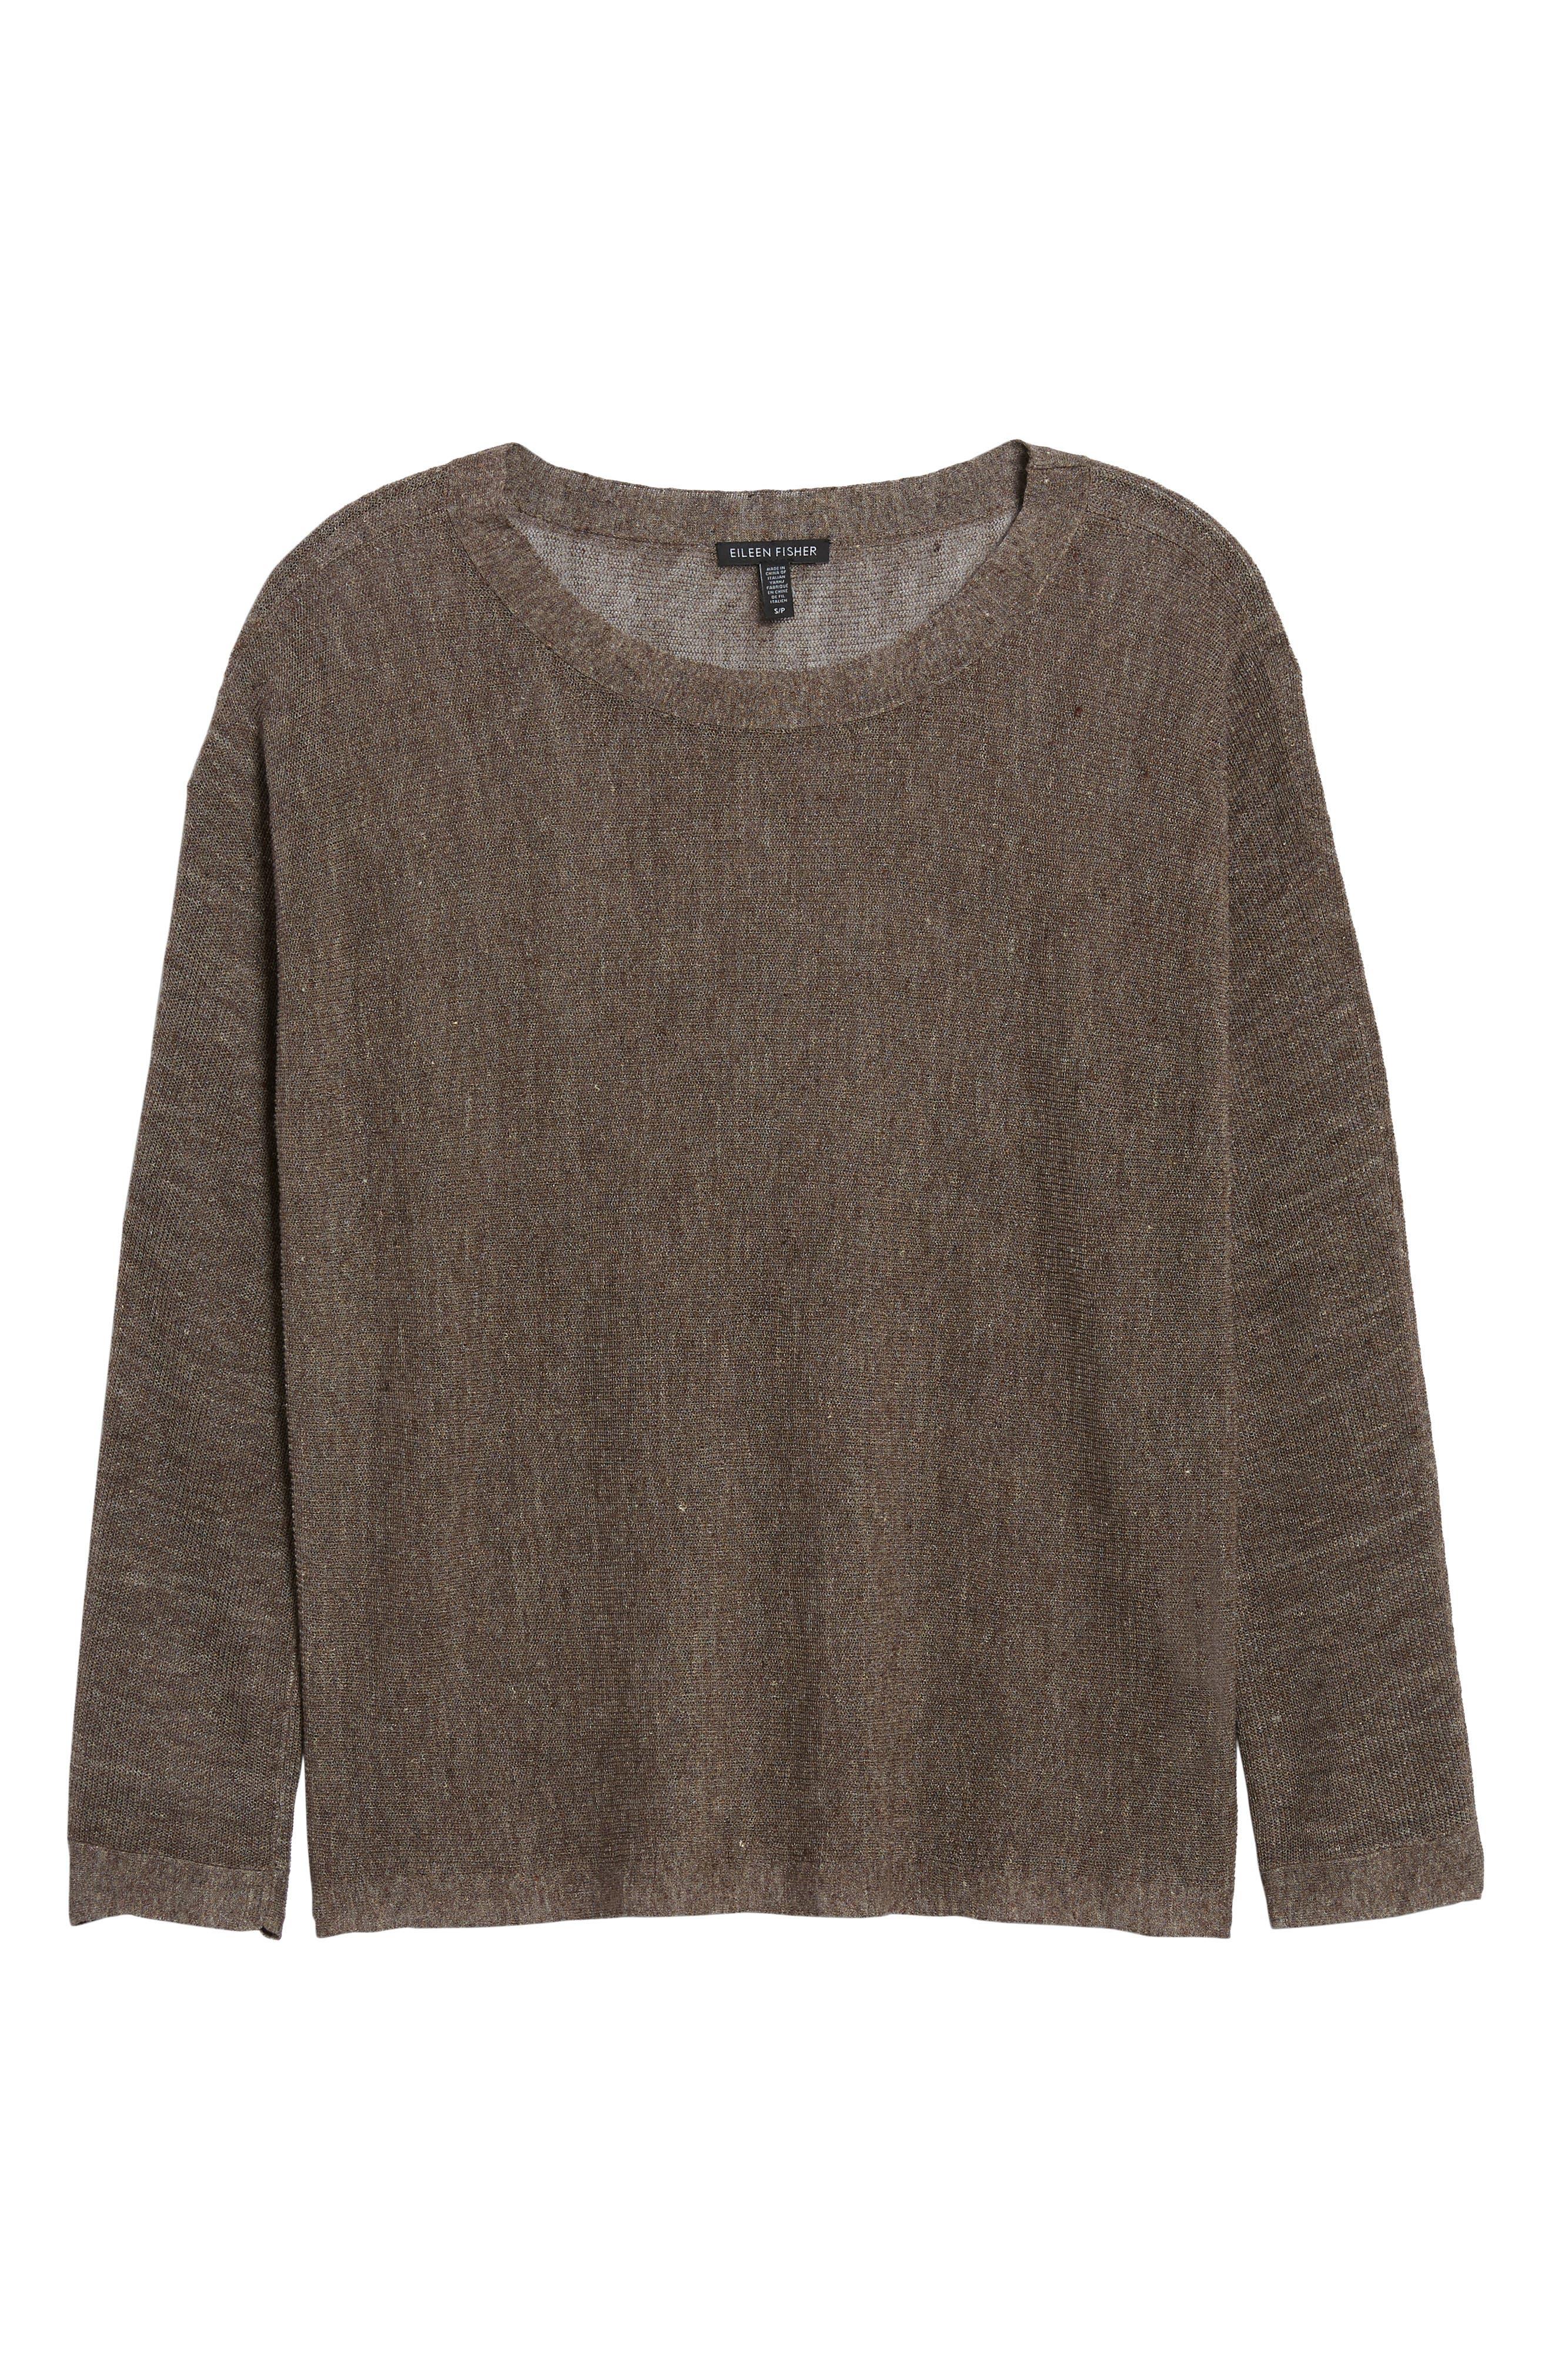 Linen Blend Sweater,                             Alternate thumbnail 7, color,                             024